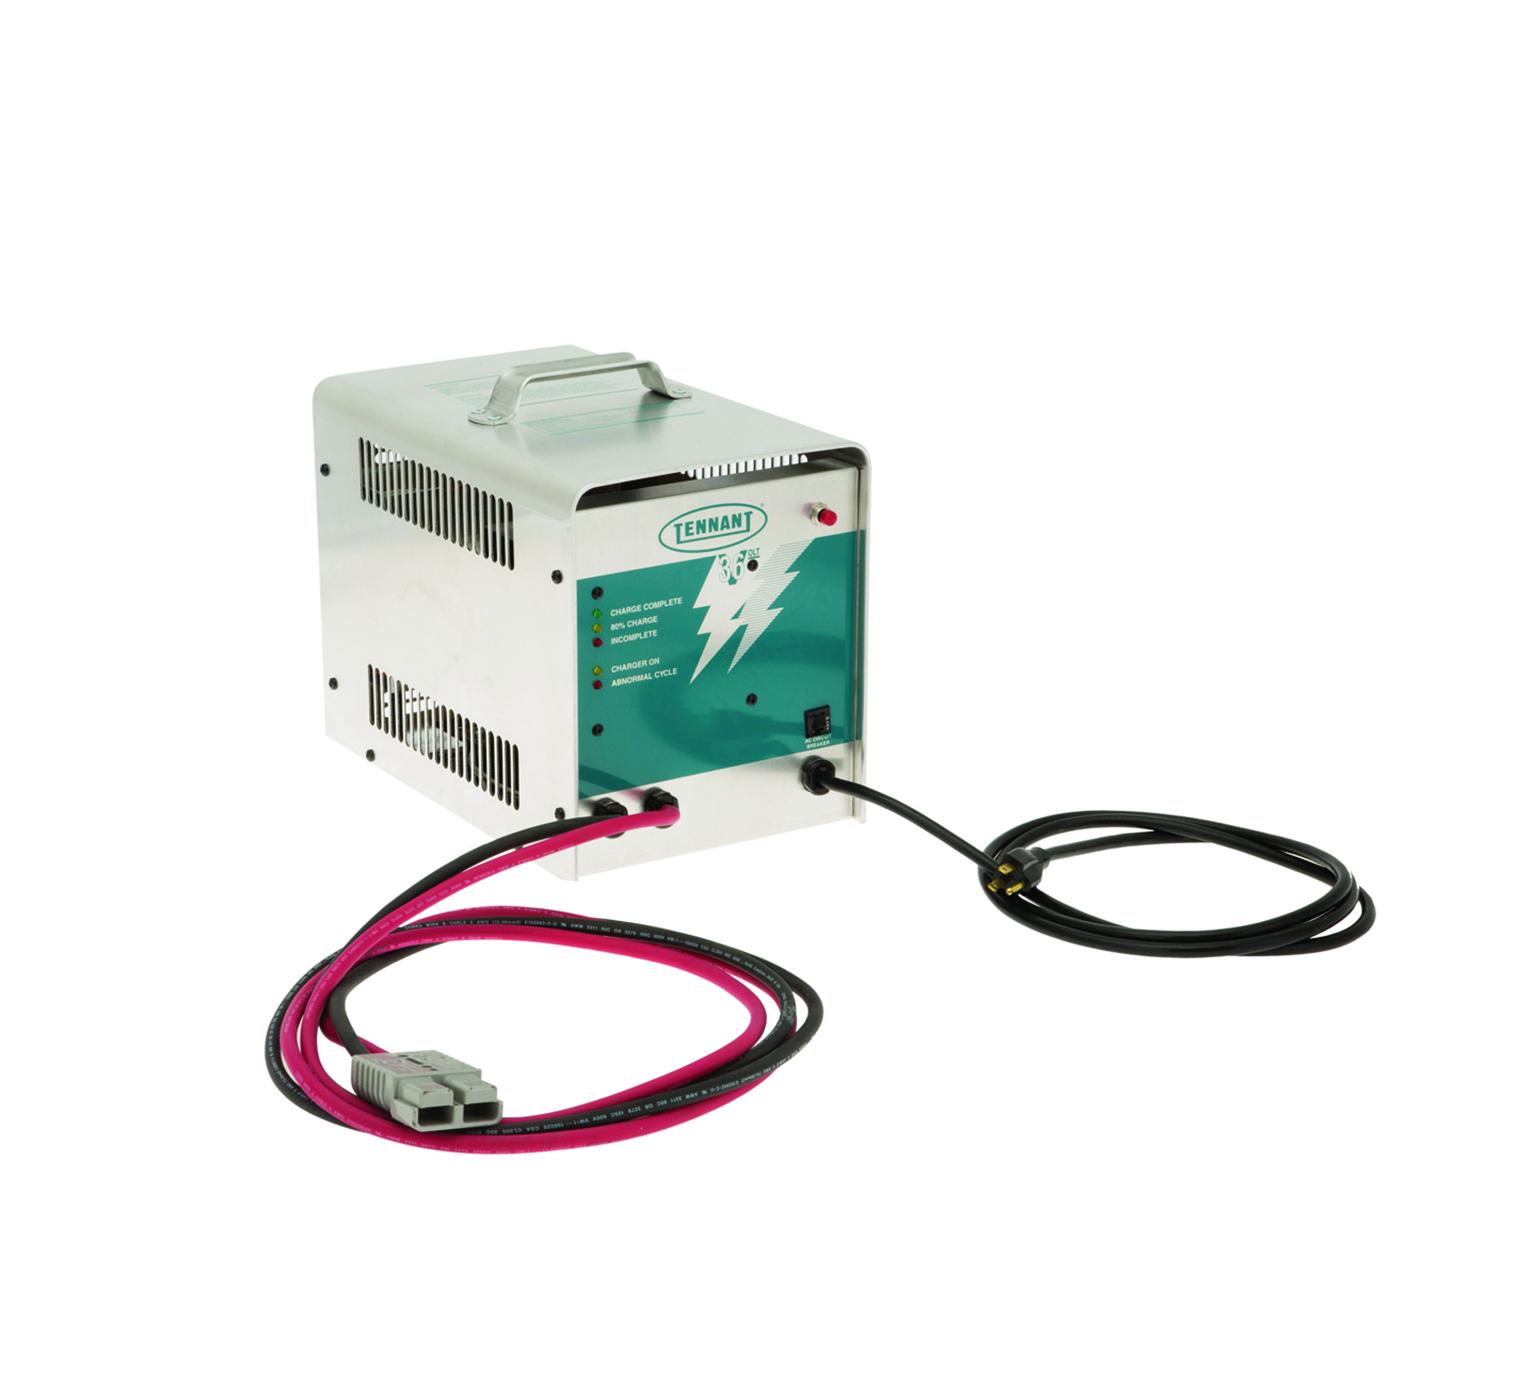 0 amperage macbook battery dcc model railway wiring diagrams tennanttrue mac 36 volt 30 amp offboard charger pn 223683